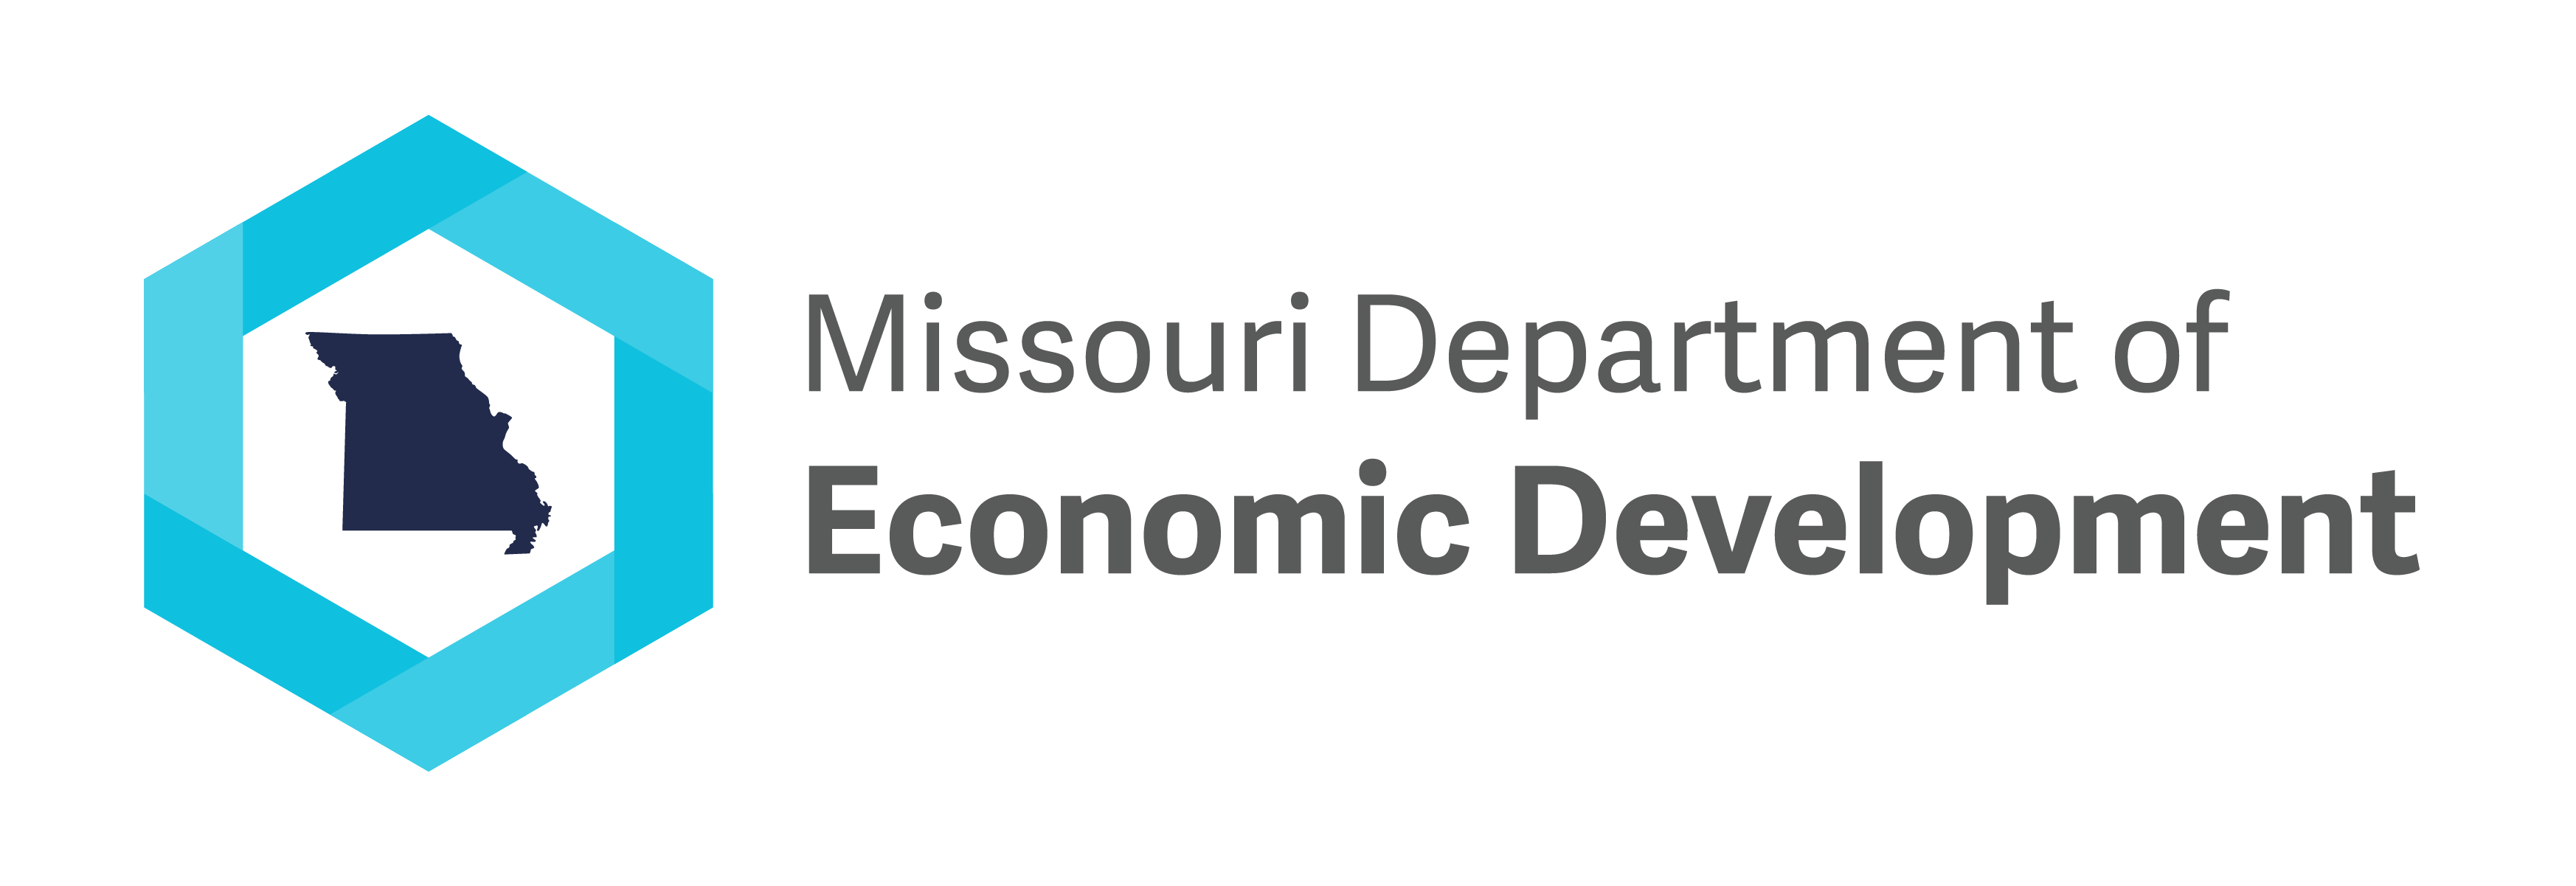 MO Department of Economic Development Logo